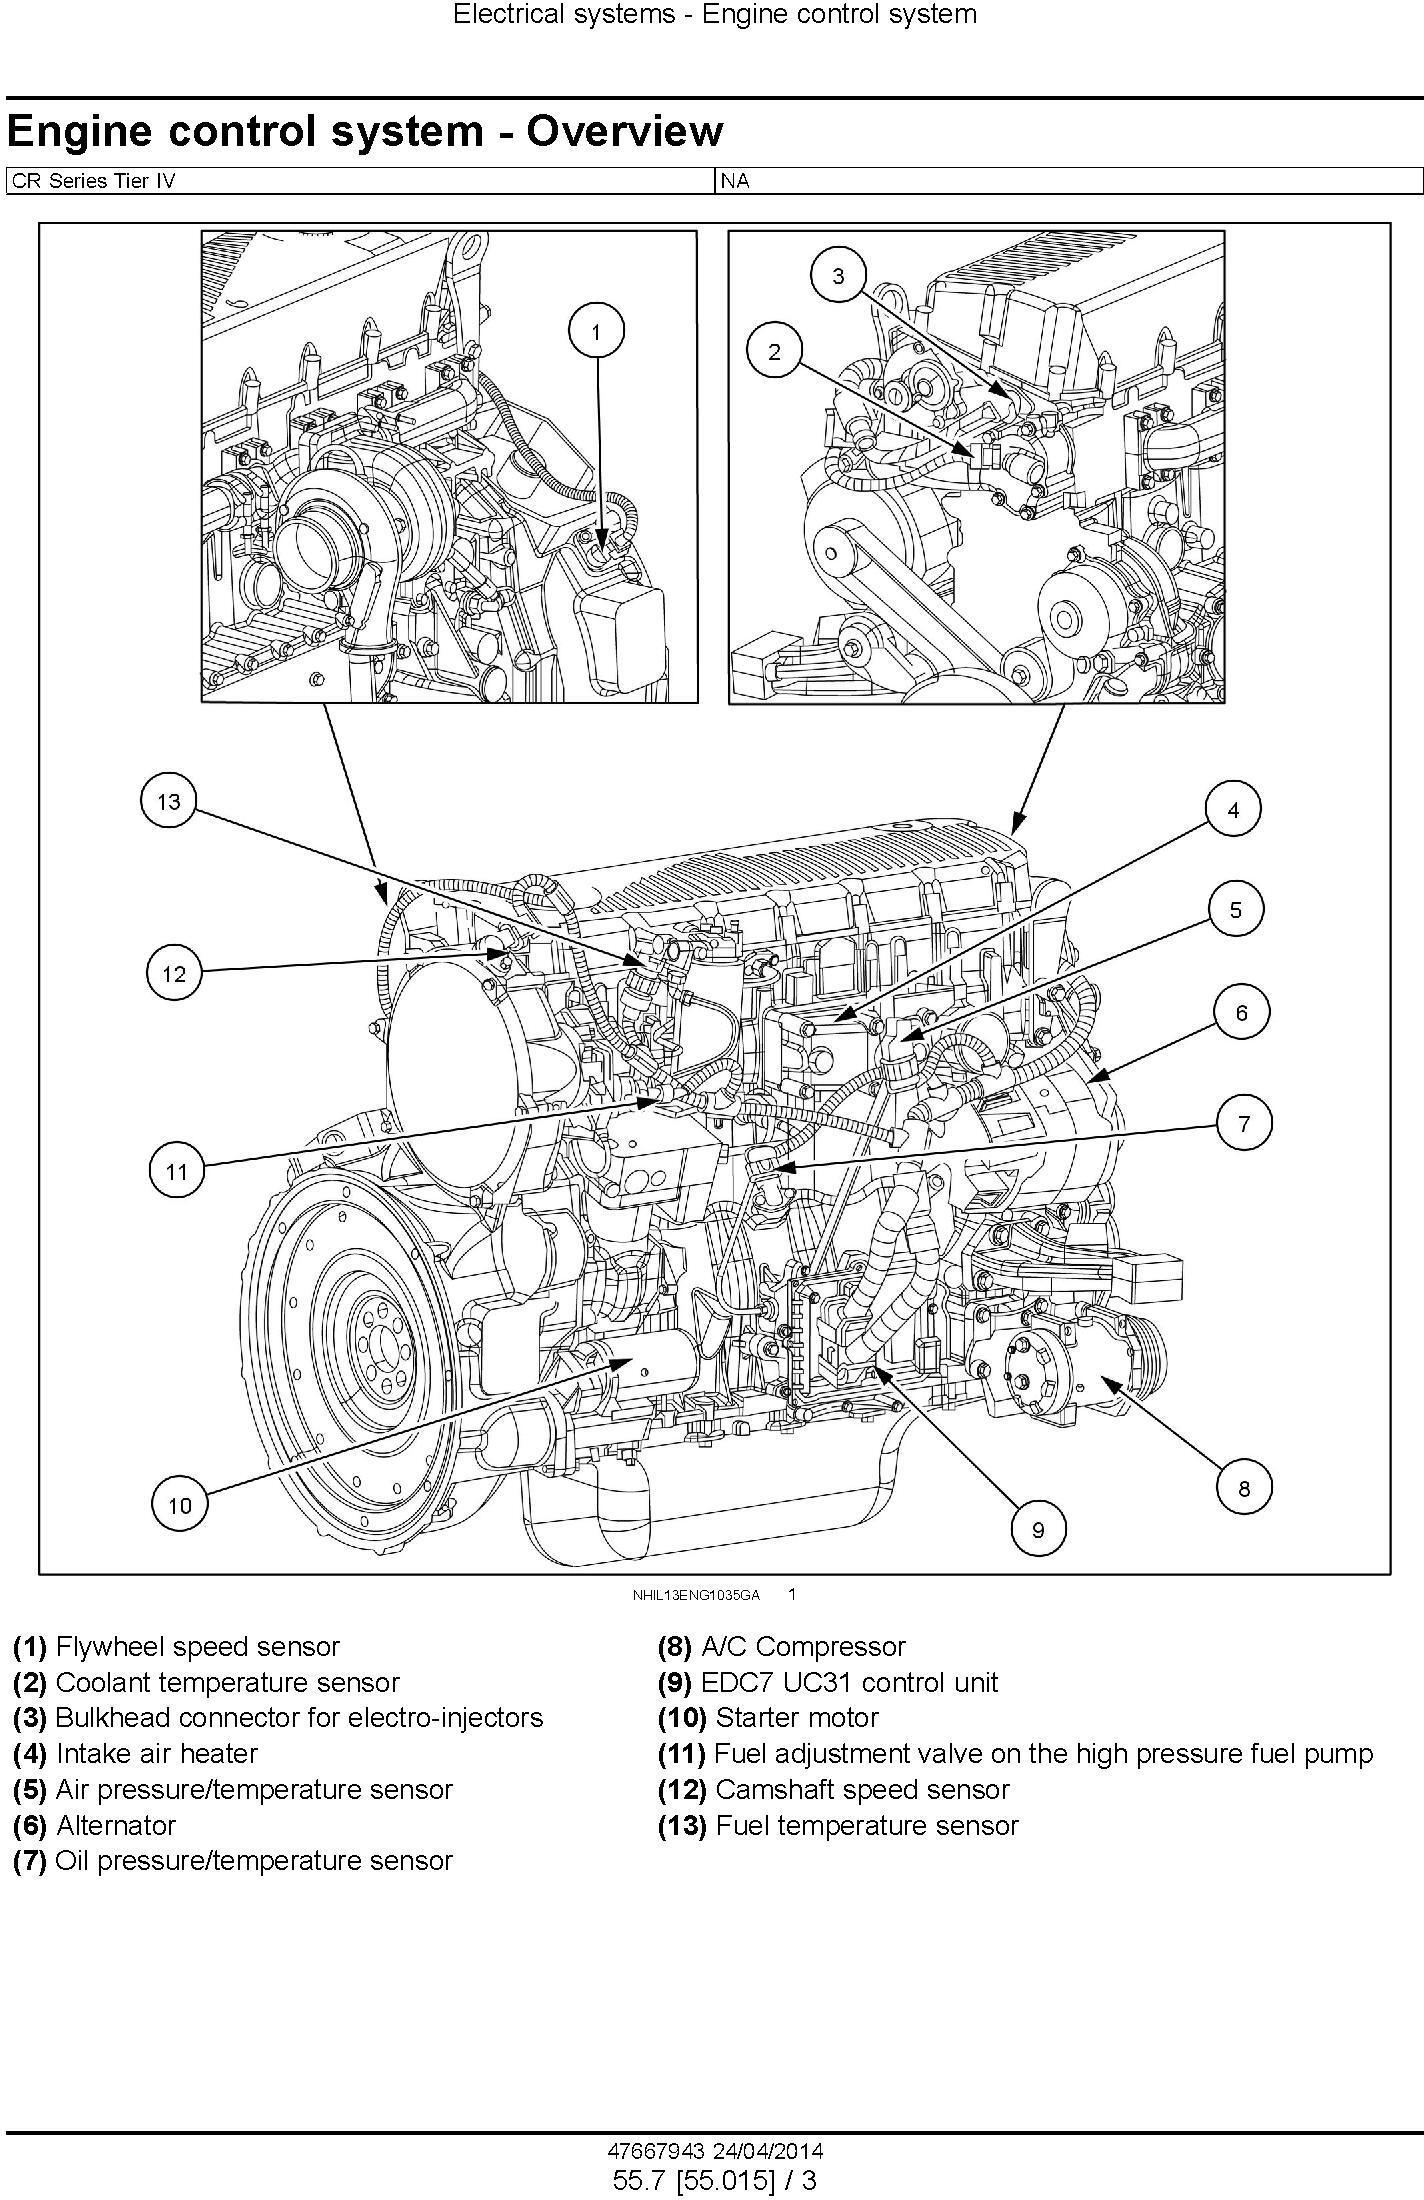 New Holland CR6090, CR7090, CR8080, CR8090, CR9090 Tier4A Combine Complete Service Manual (USA) - 3